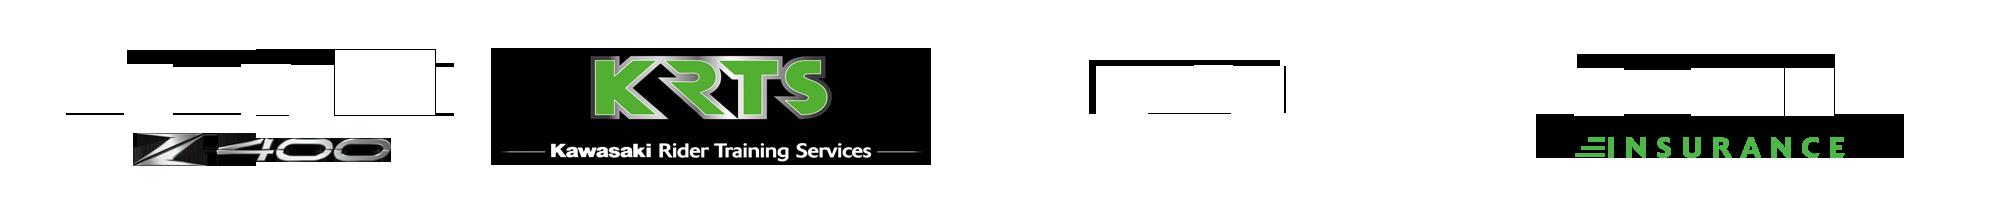 sponsors-bar-2000pxW-BUILT.png